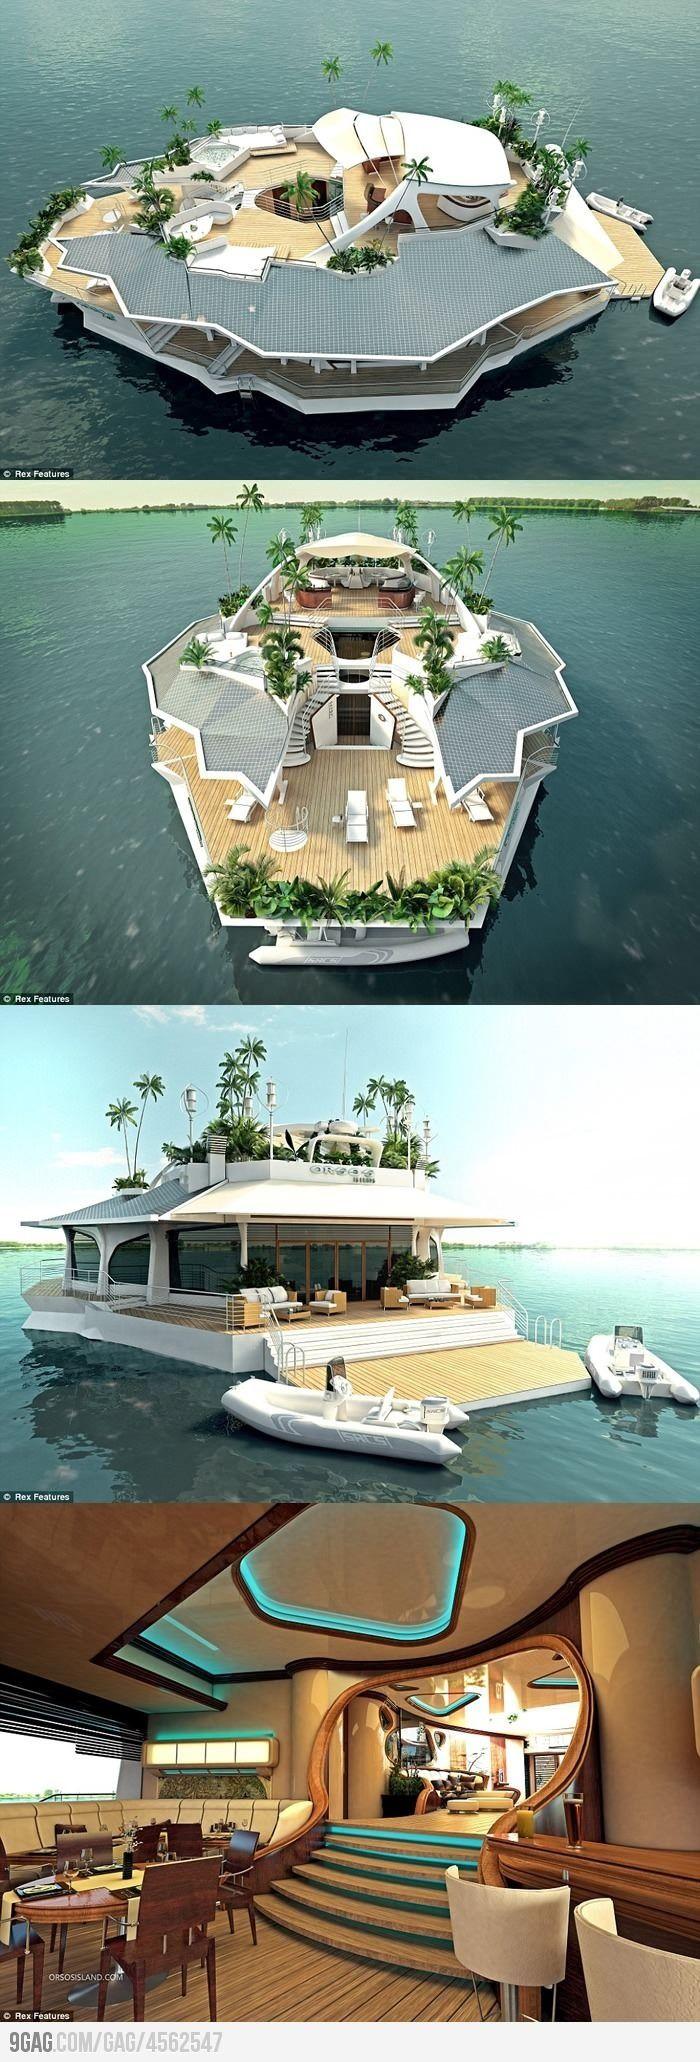 My very own island boat house .. Sweet!